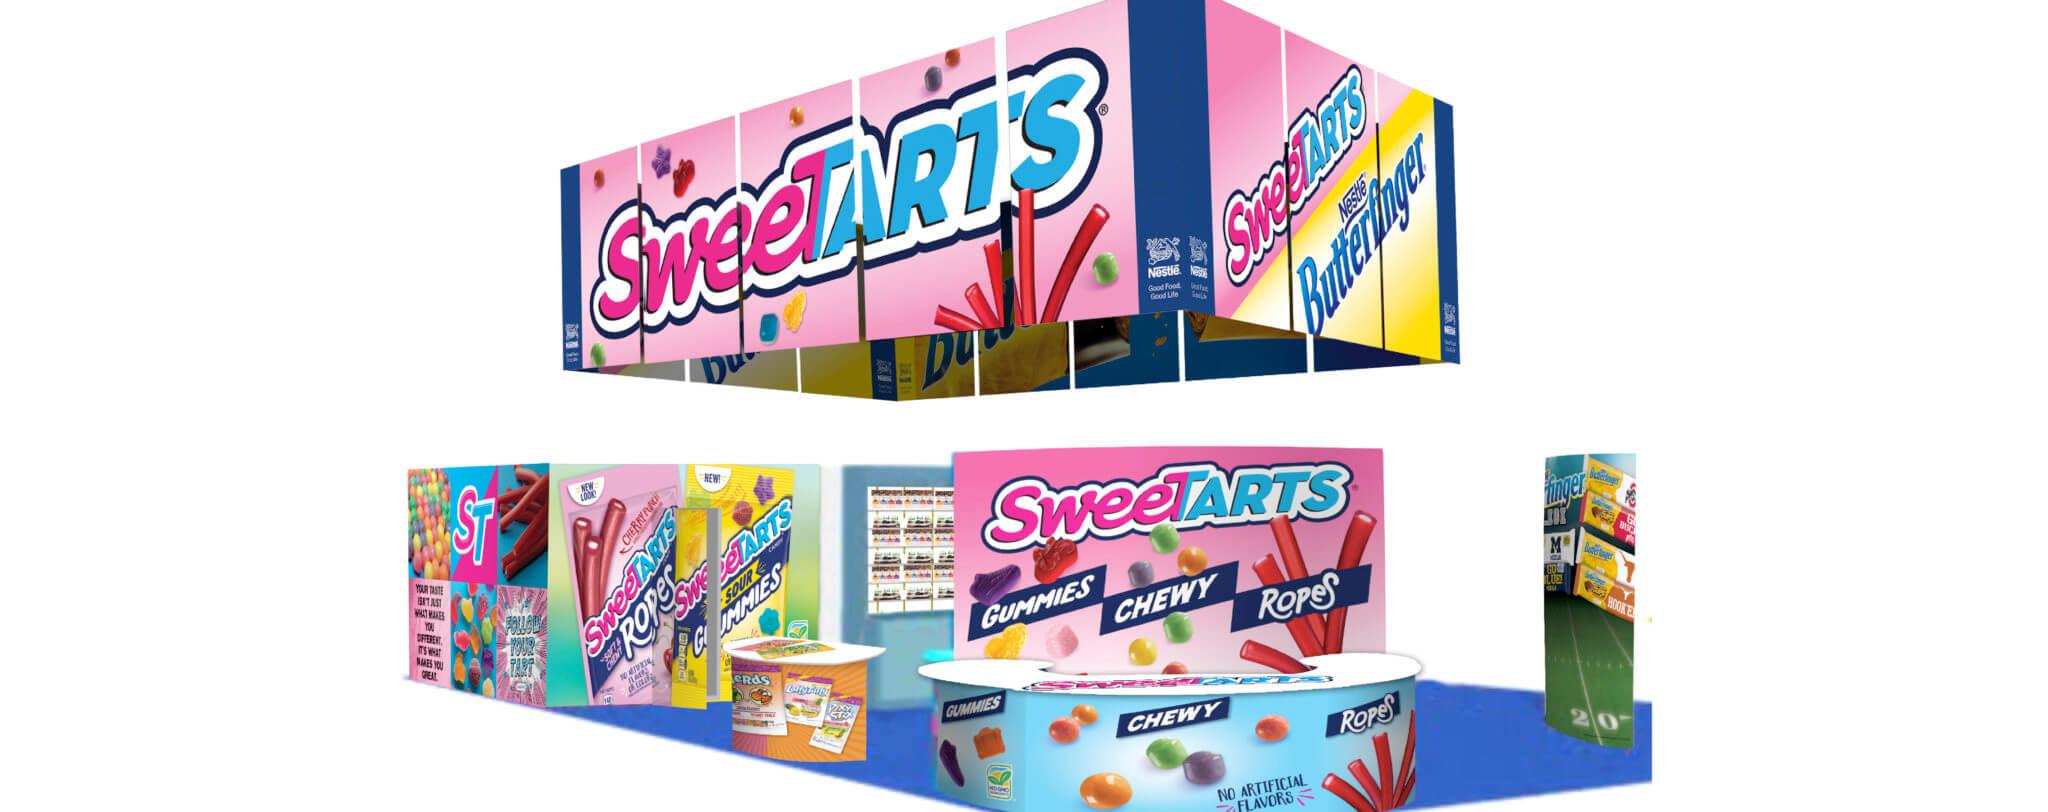 sweet-snacks-expo-image-top